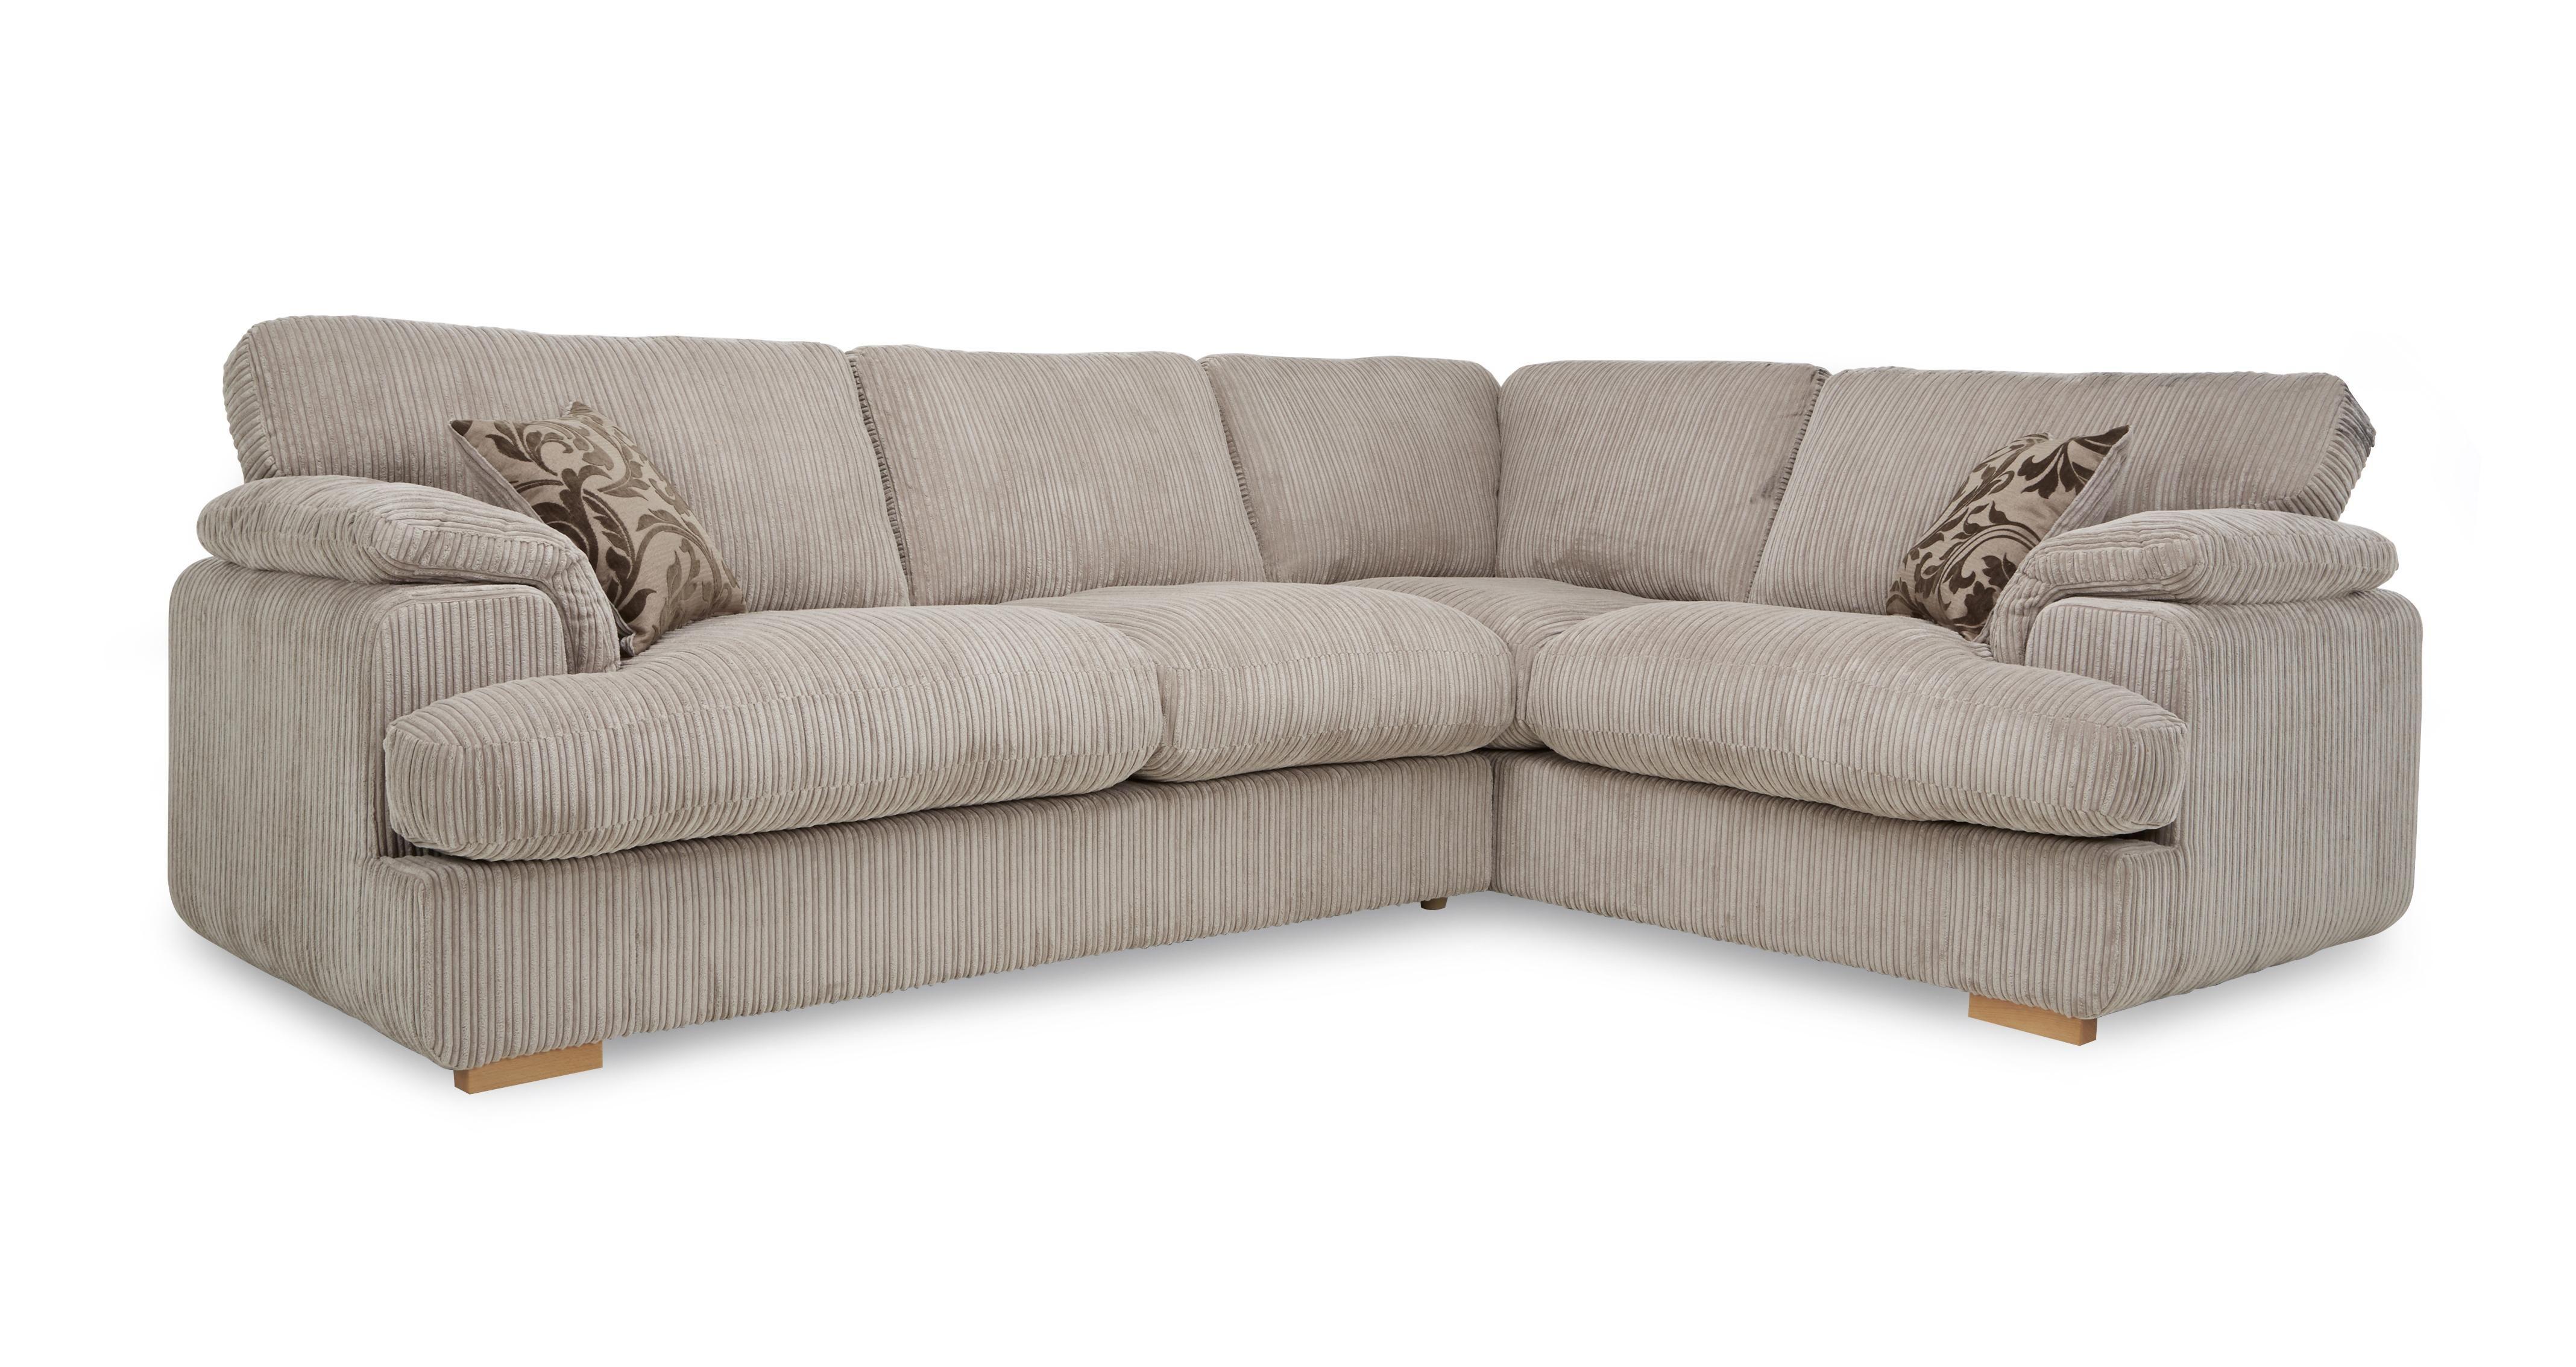 Celine Left Arm Facing 2 Seater Formal Back Deluxe Corner Sofa Bed In 2020 Corner Sofa Sofa Bed Dfs Sofa